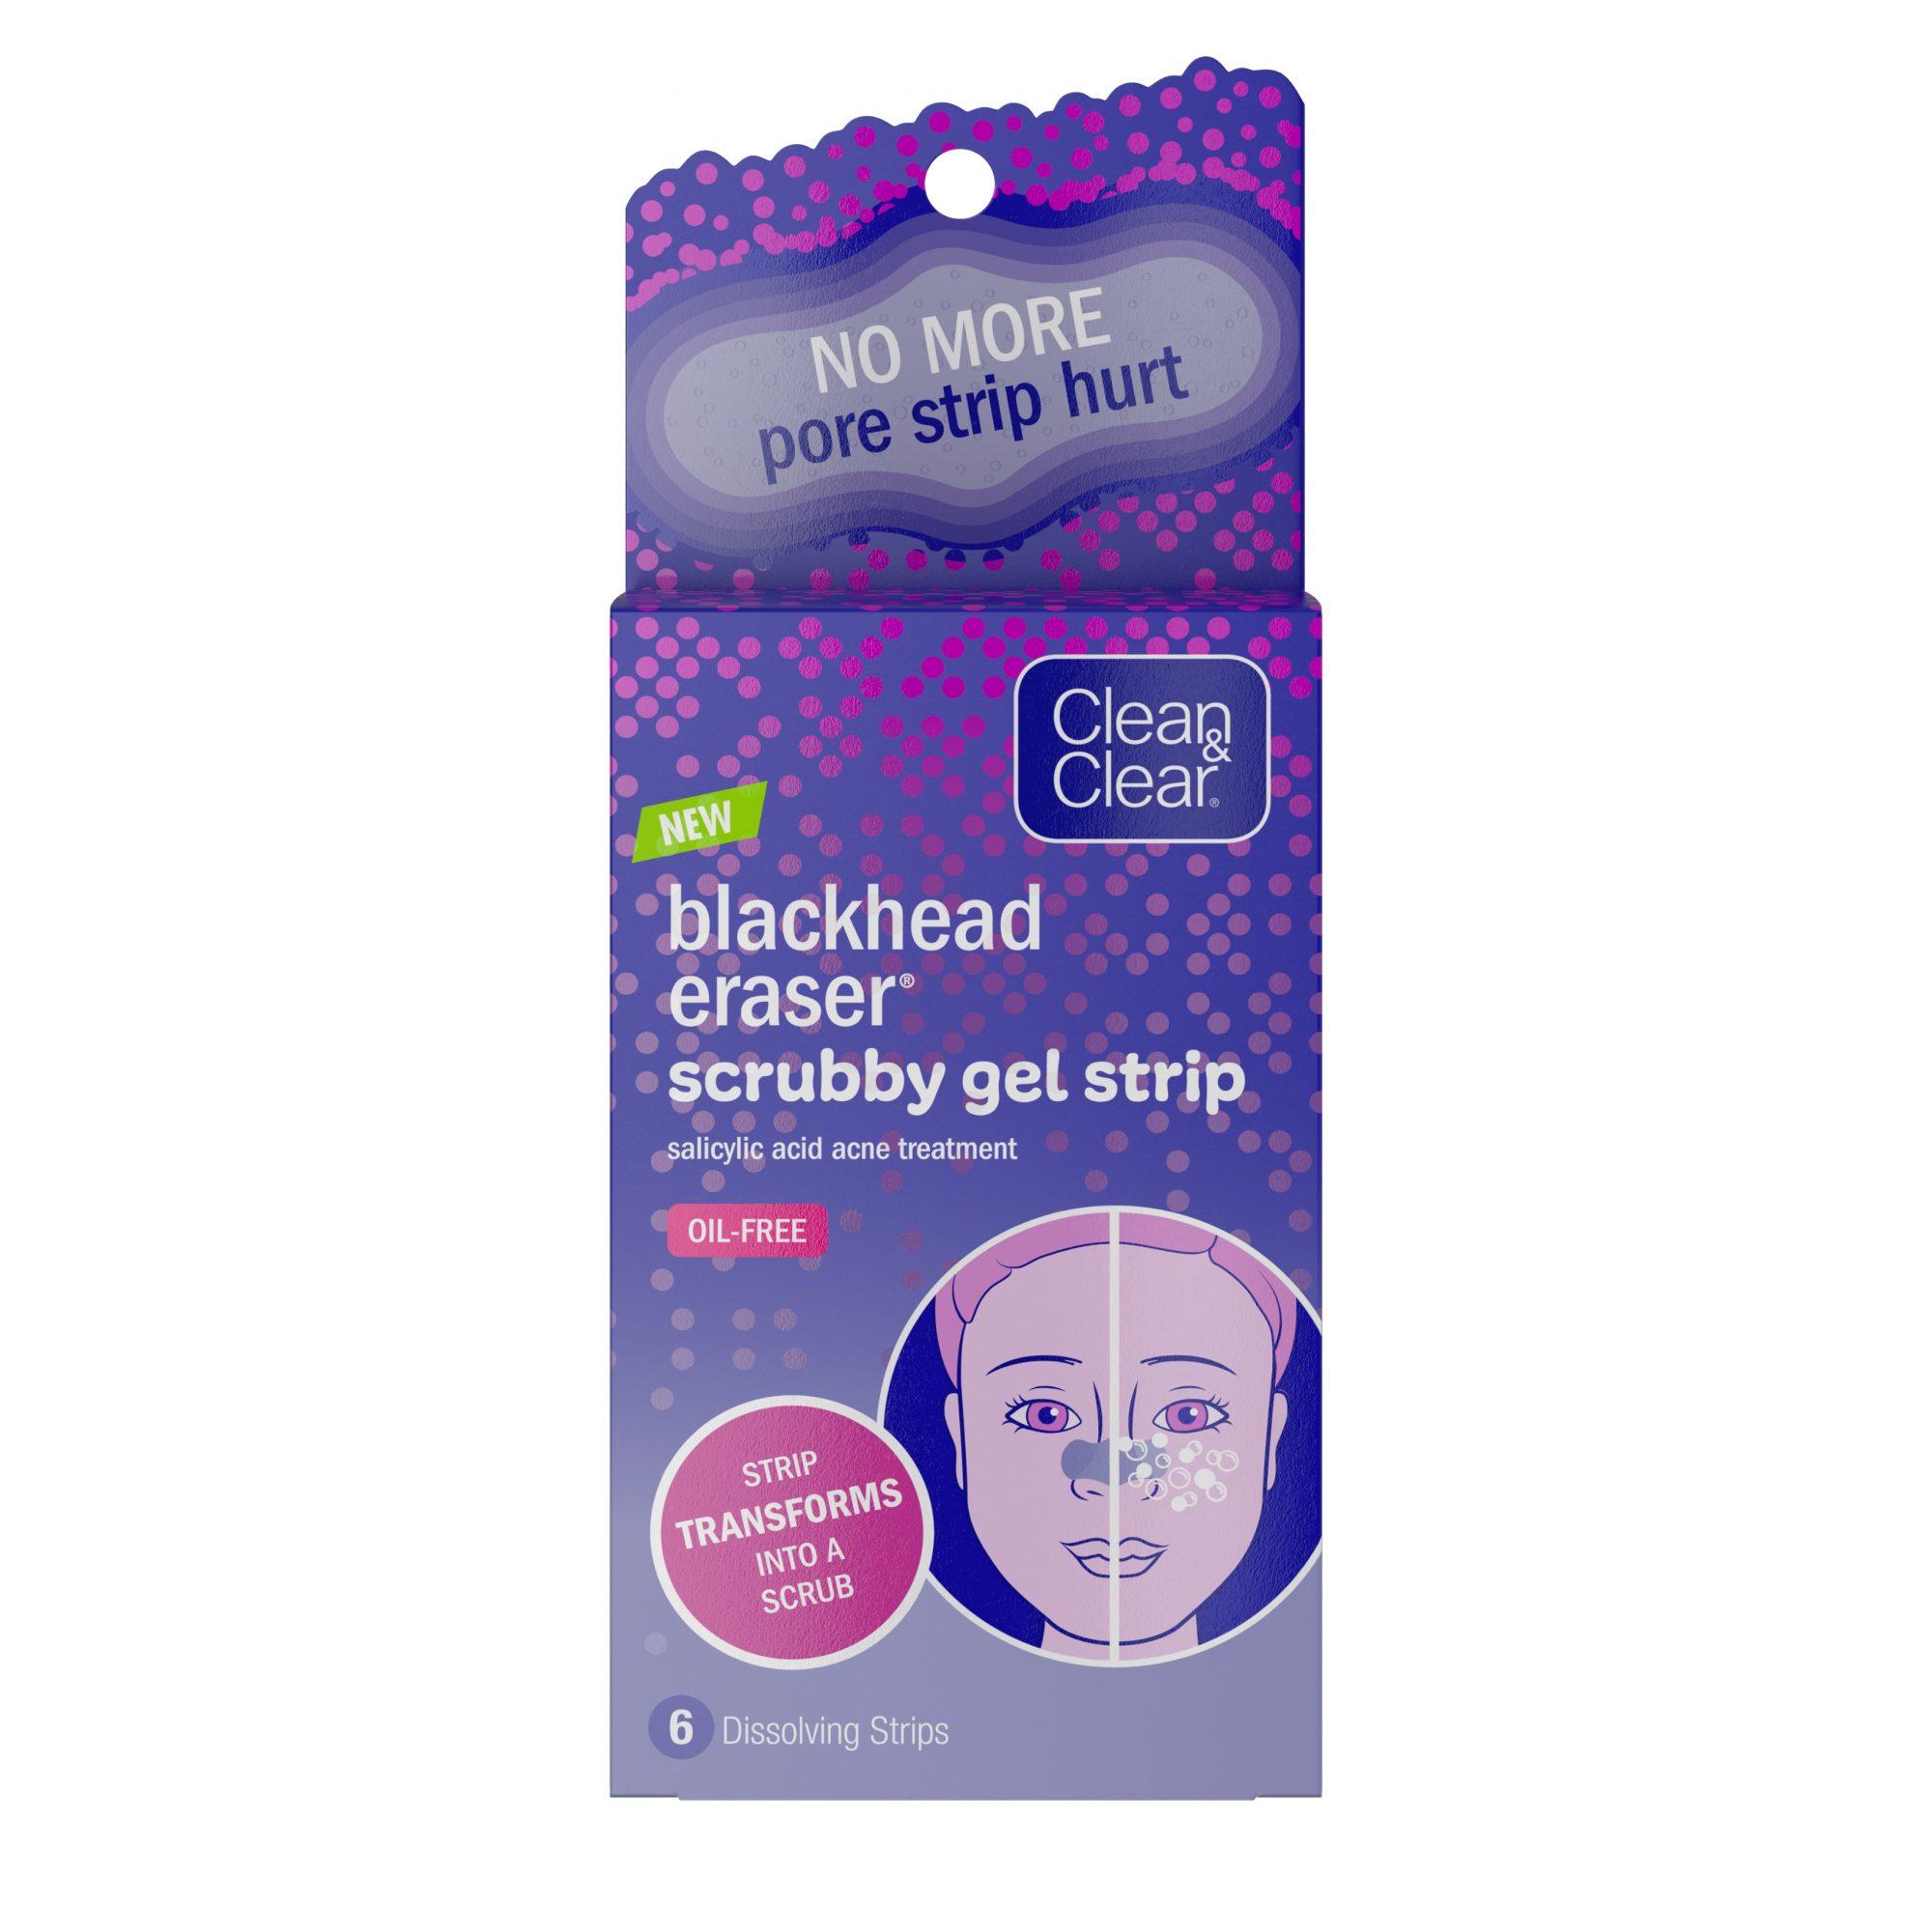 Clean and Clear Blackhead Eraser Scrubby Gel Strip